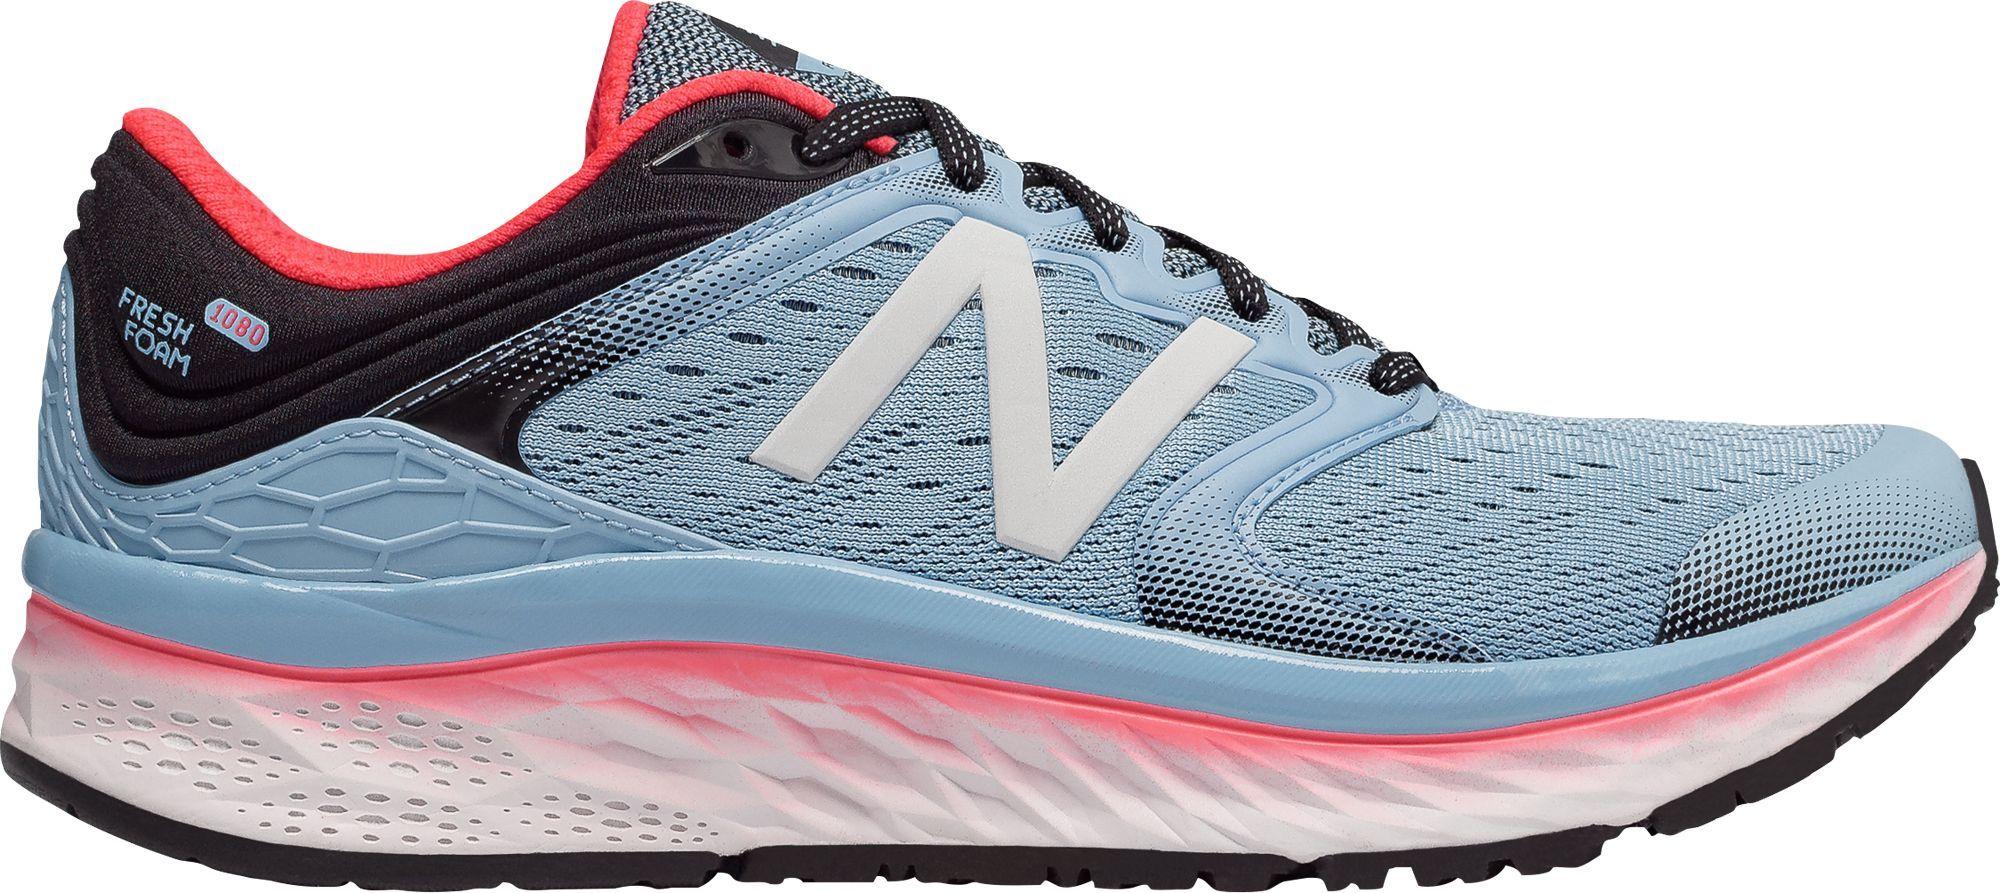 d3a137c7f8 New Balance Women's Fresh Foam 1080v8 Running Shoes in 2019 ...